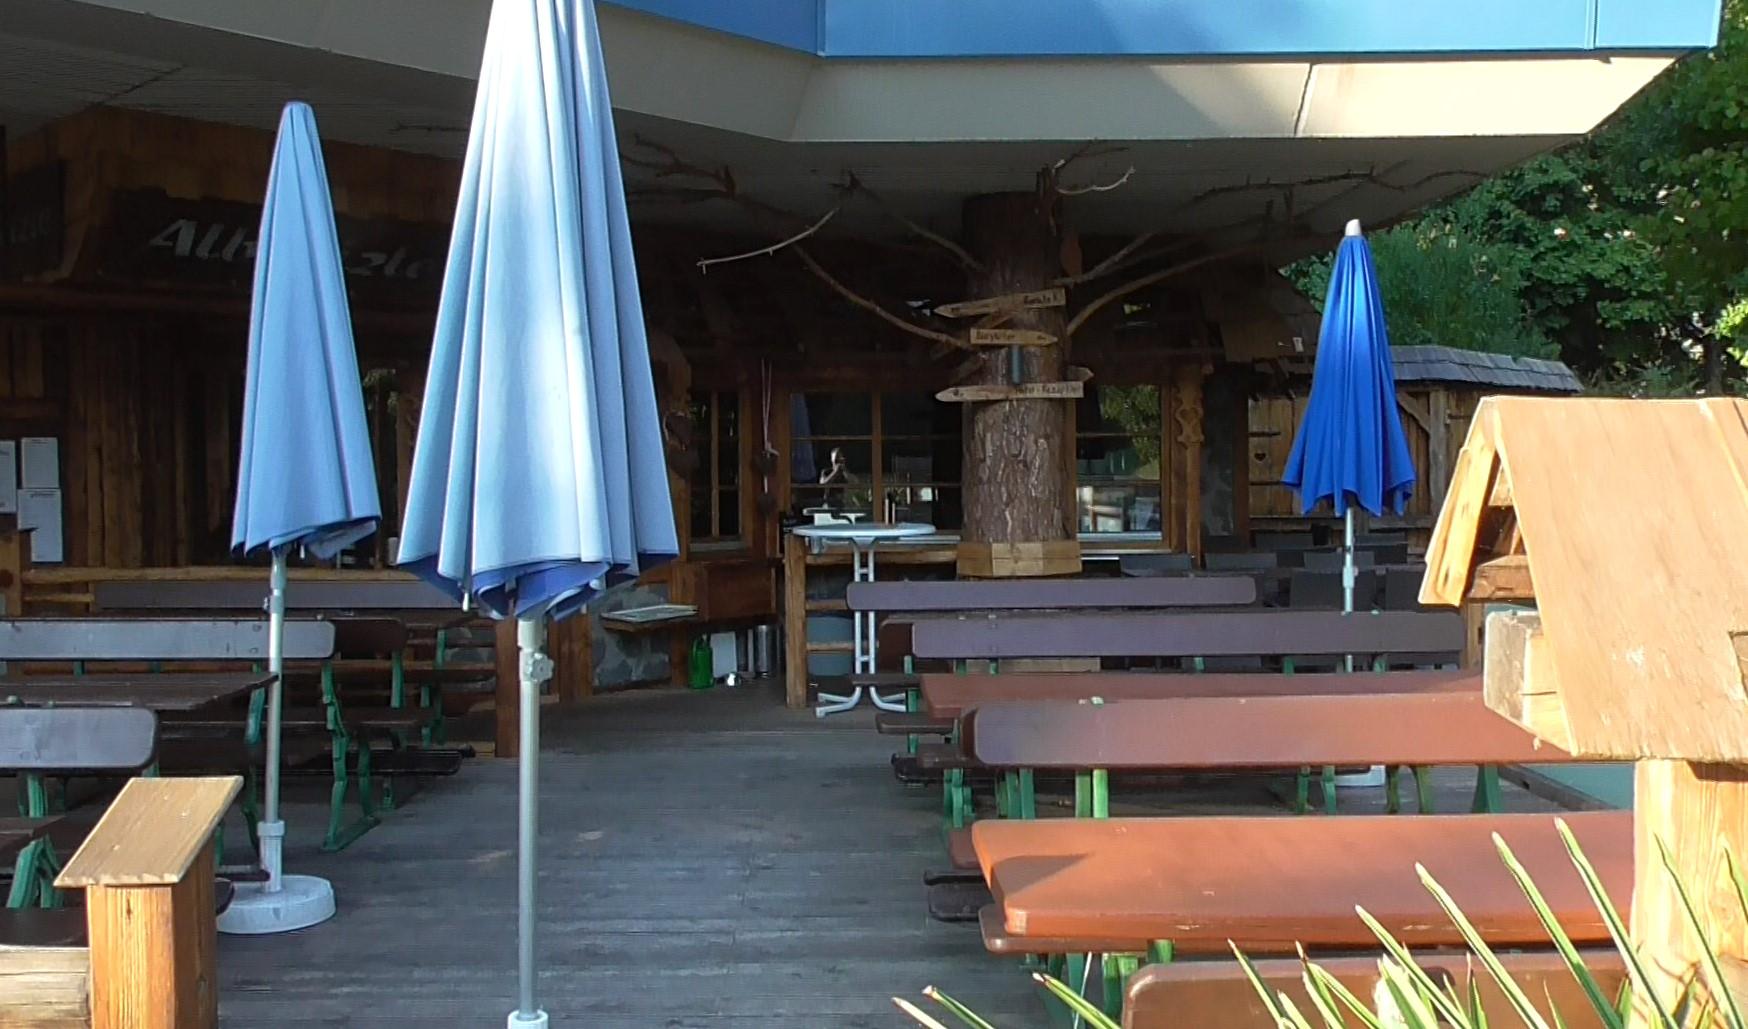 Albbeizle im Hotel Graf Eberhard